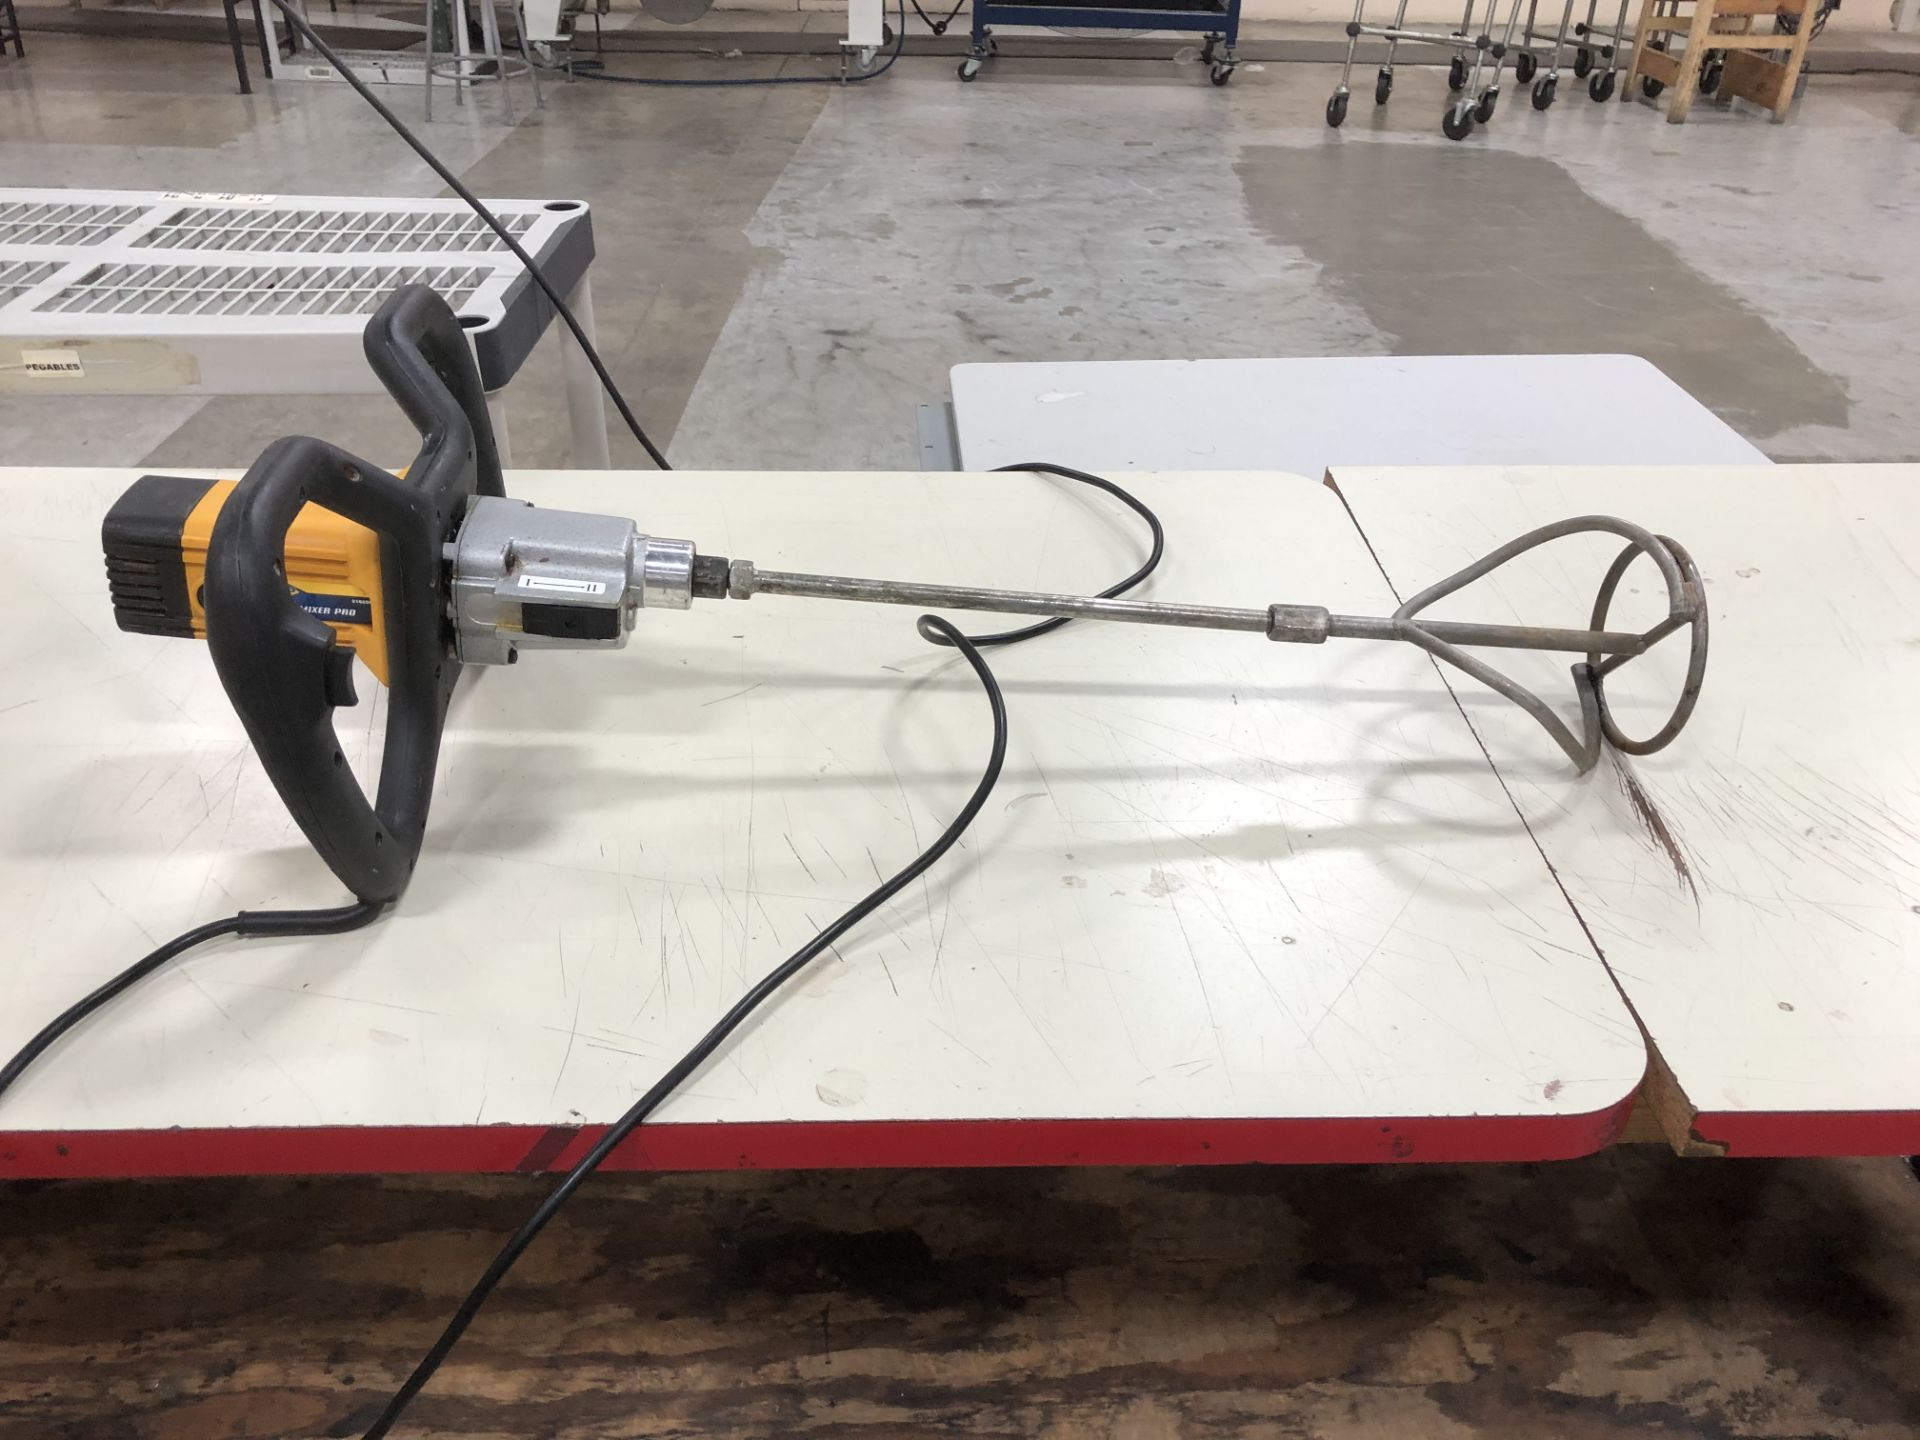 Lot 6 - QEP 1300 Wet Power Mixer, 120V | Rig Fee: $0